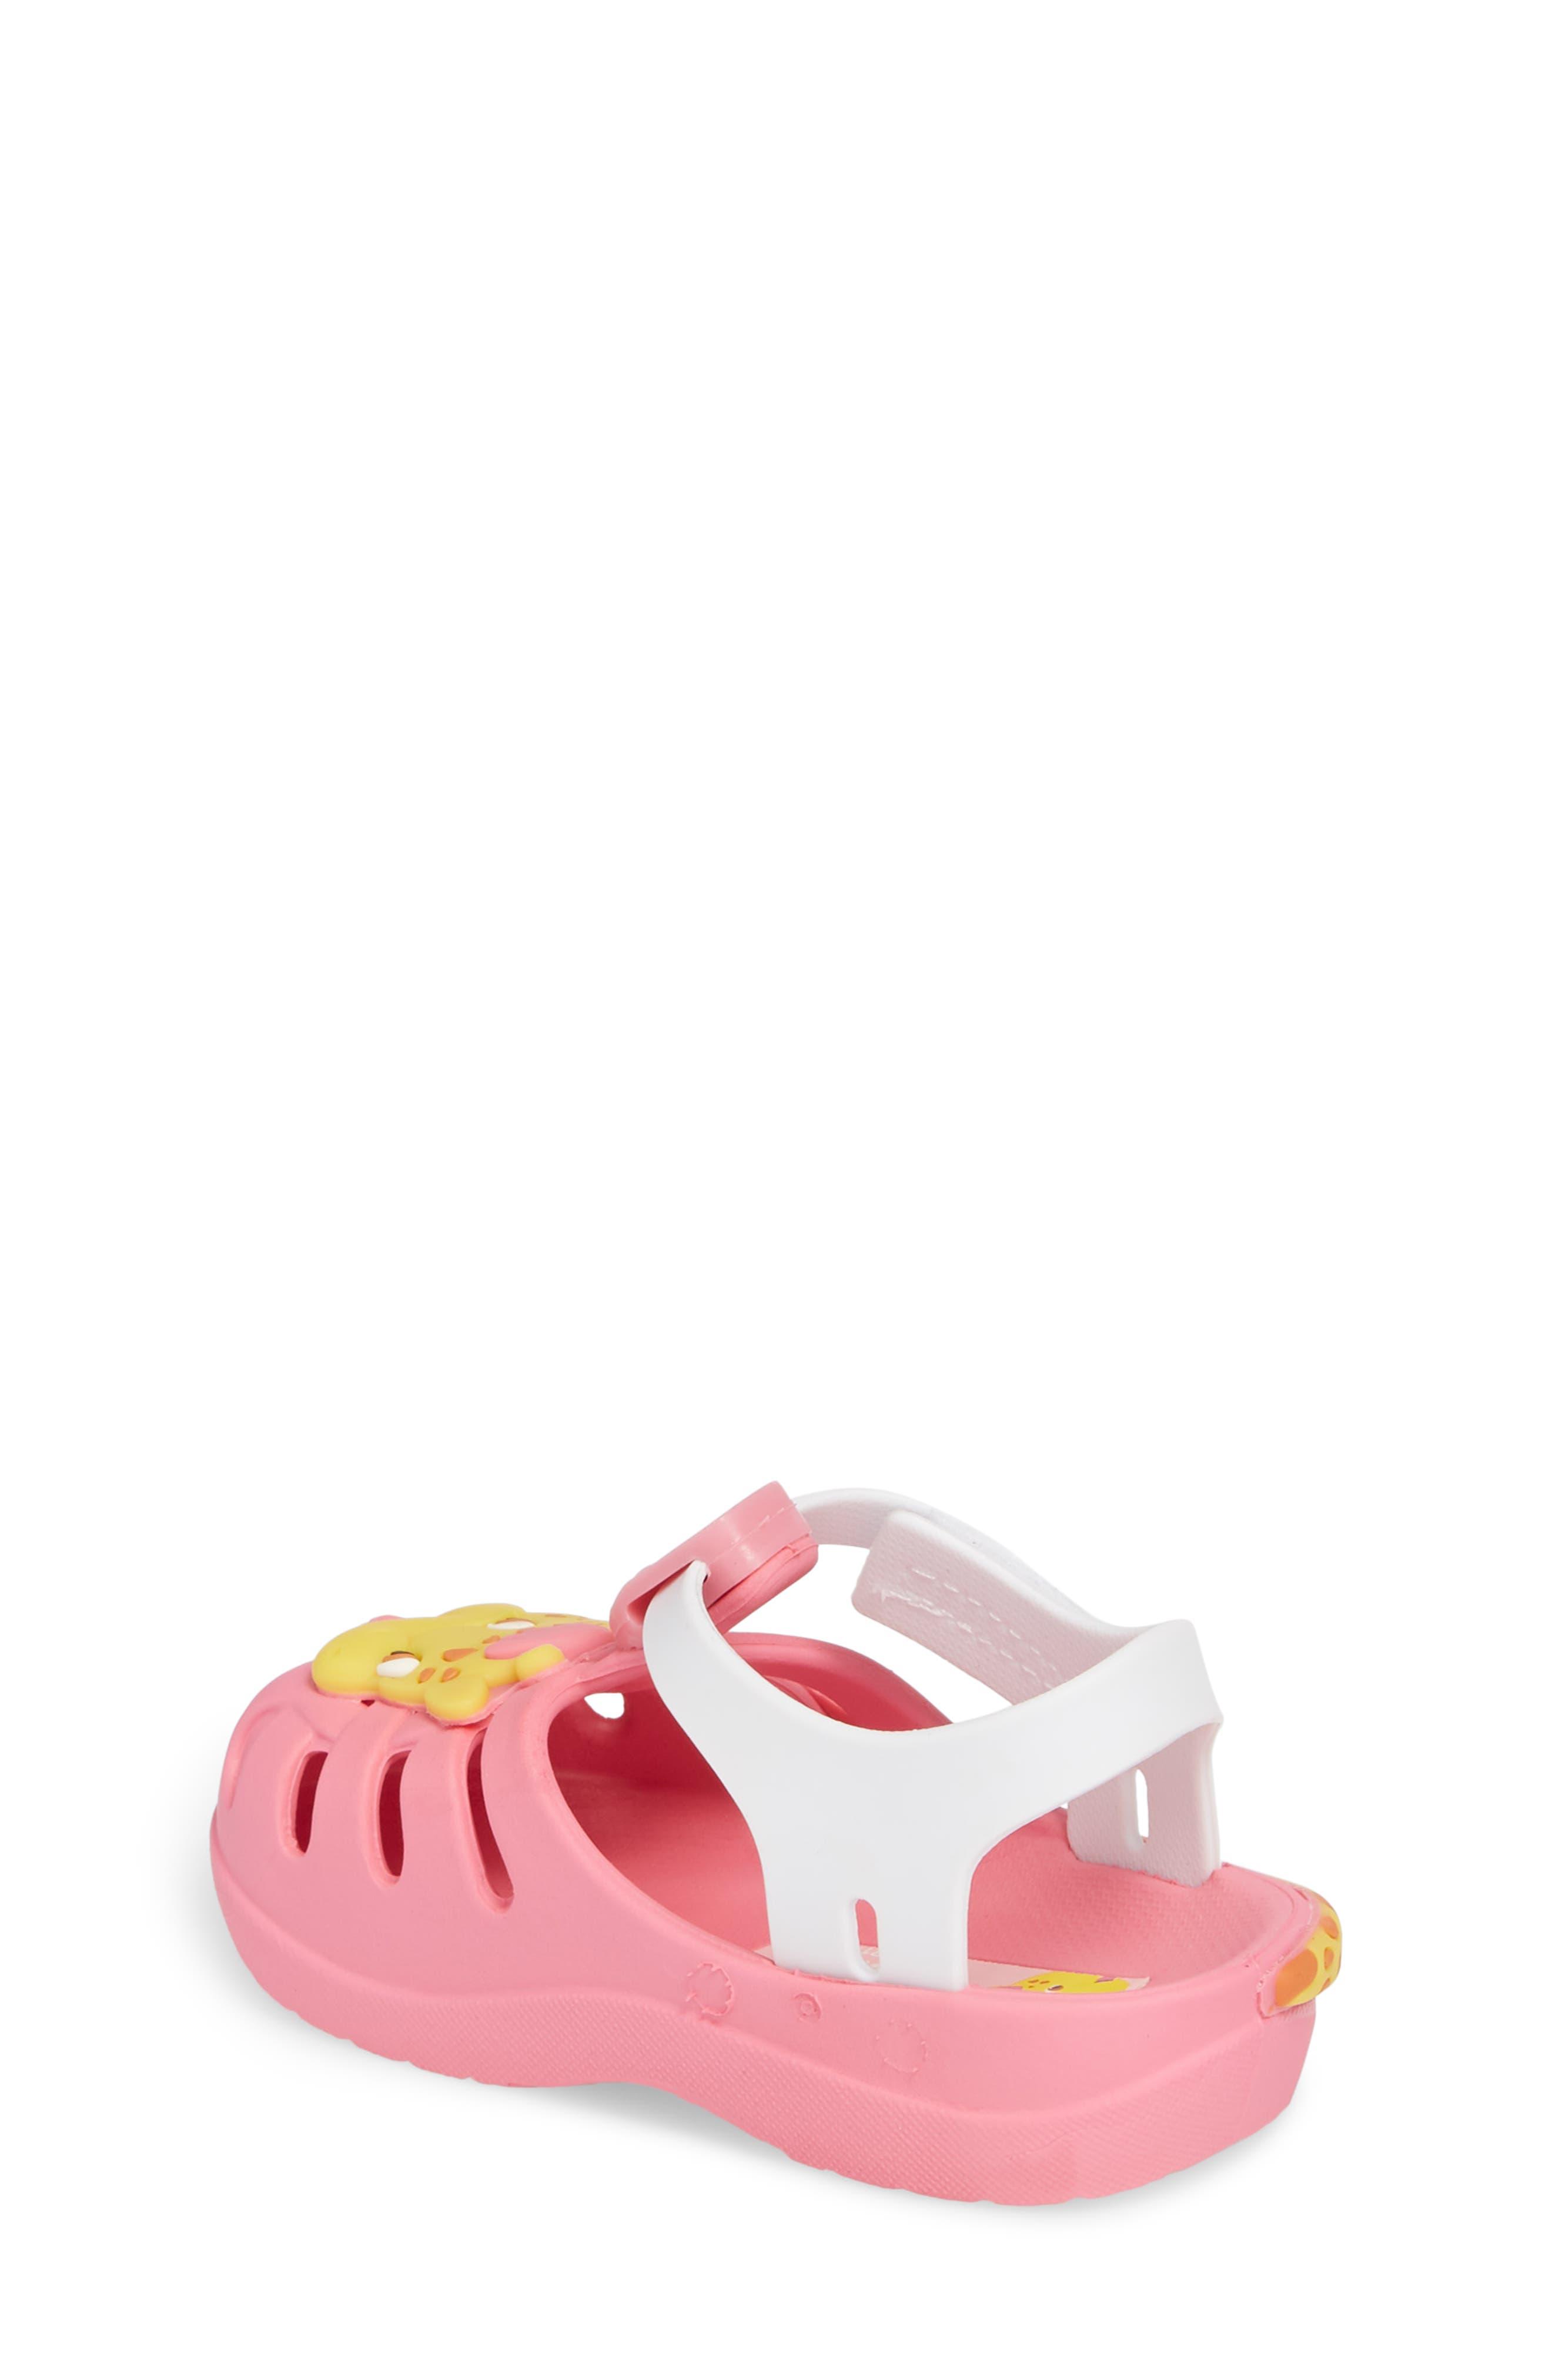 Summer Baby Waterproof Sandal,                             Alternate thumbnail 2, color,                             Pink/ White